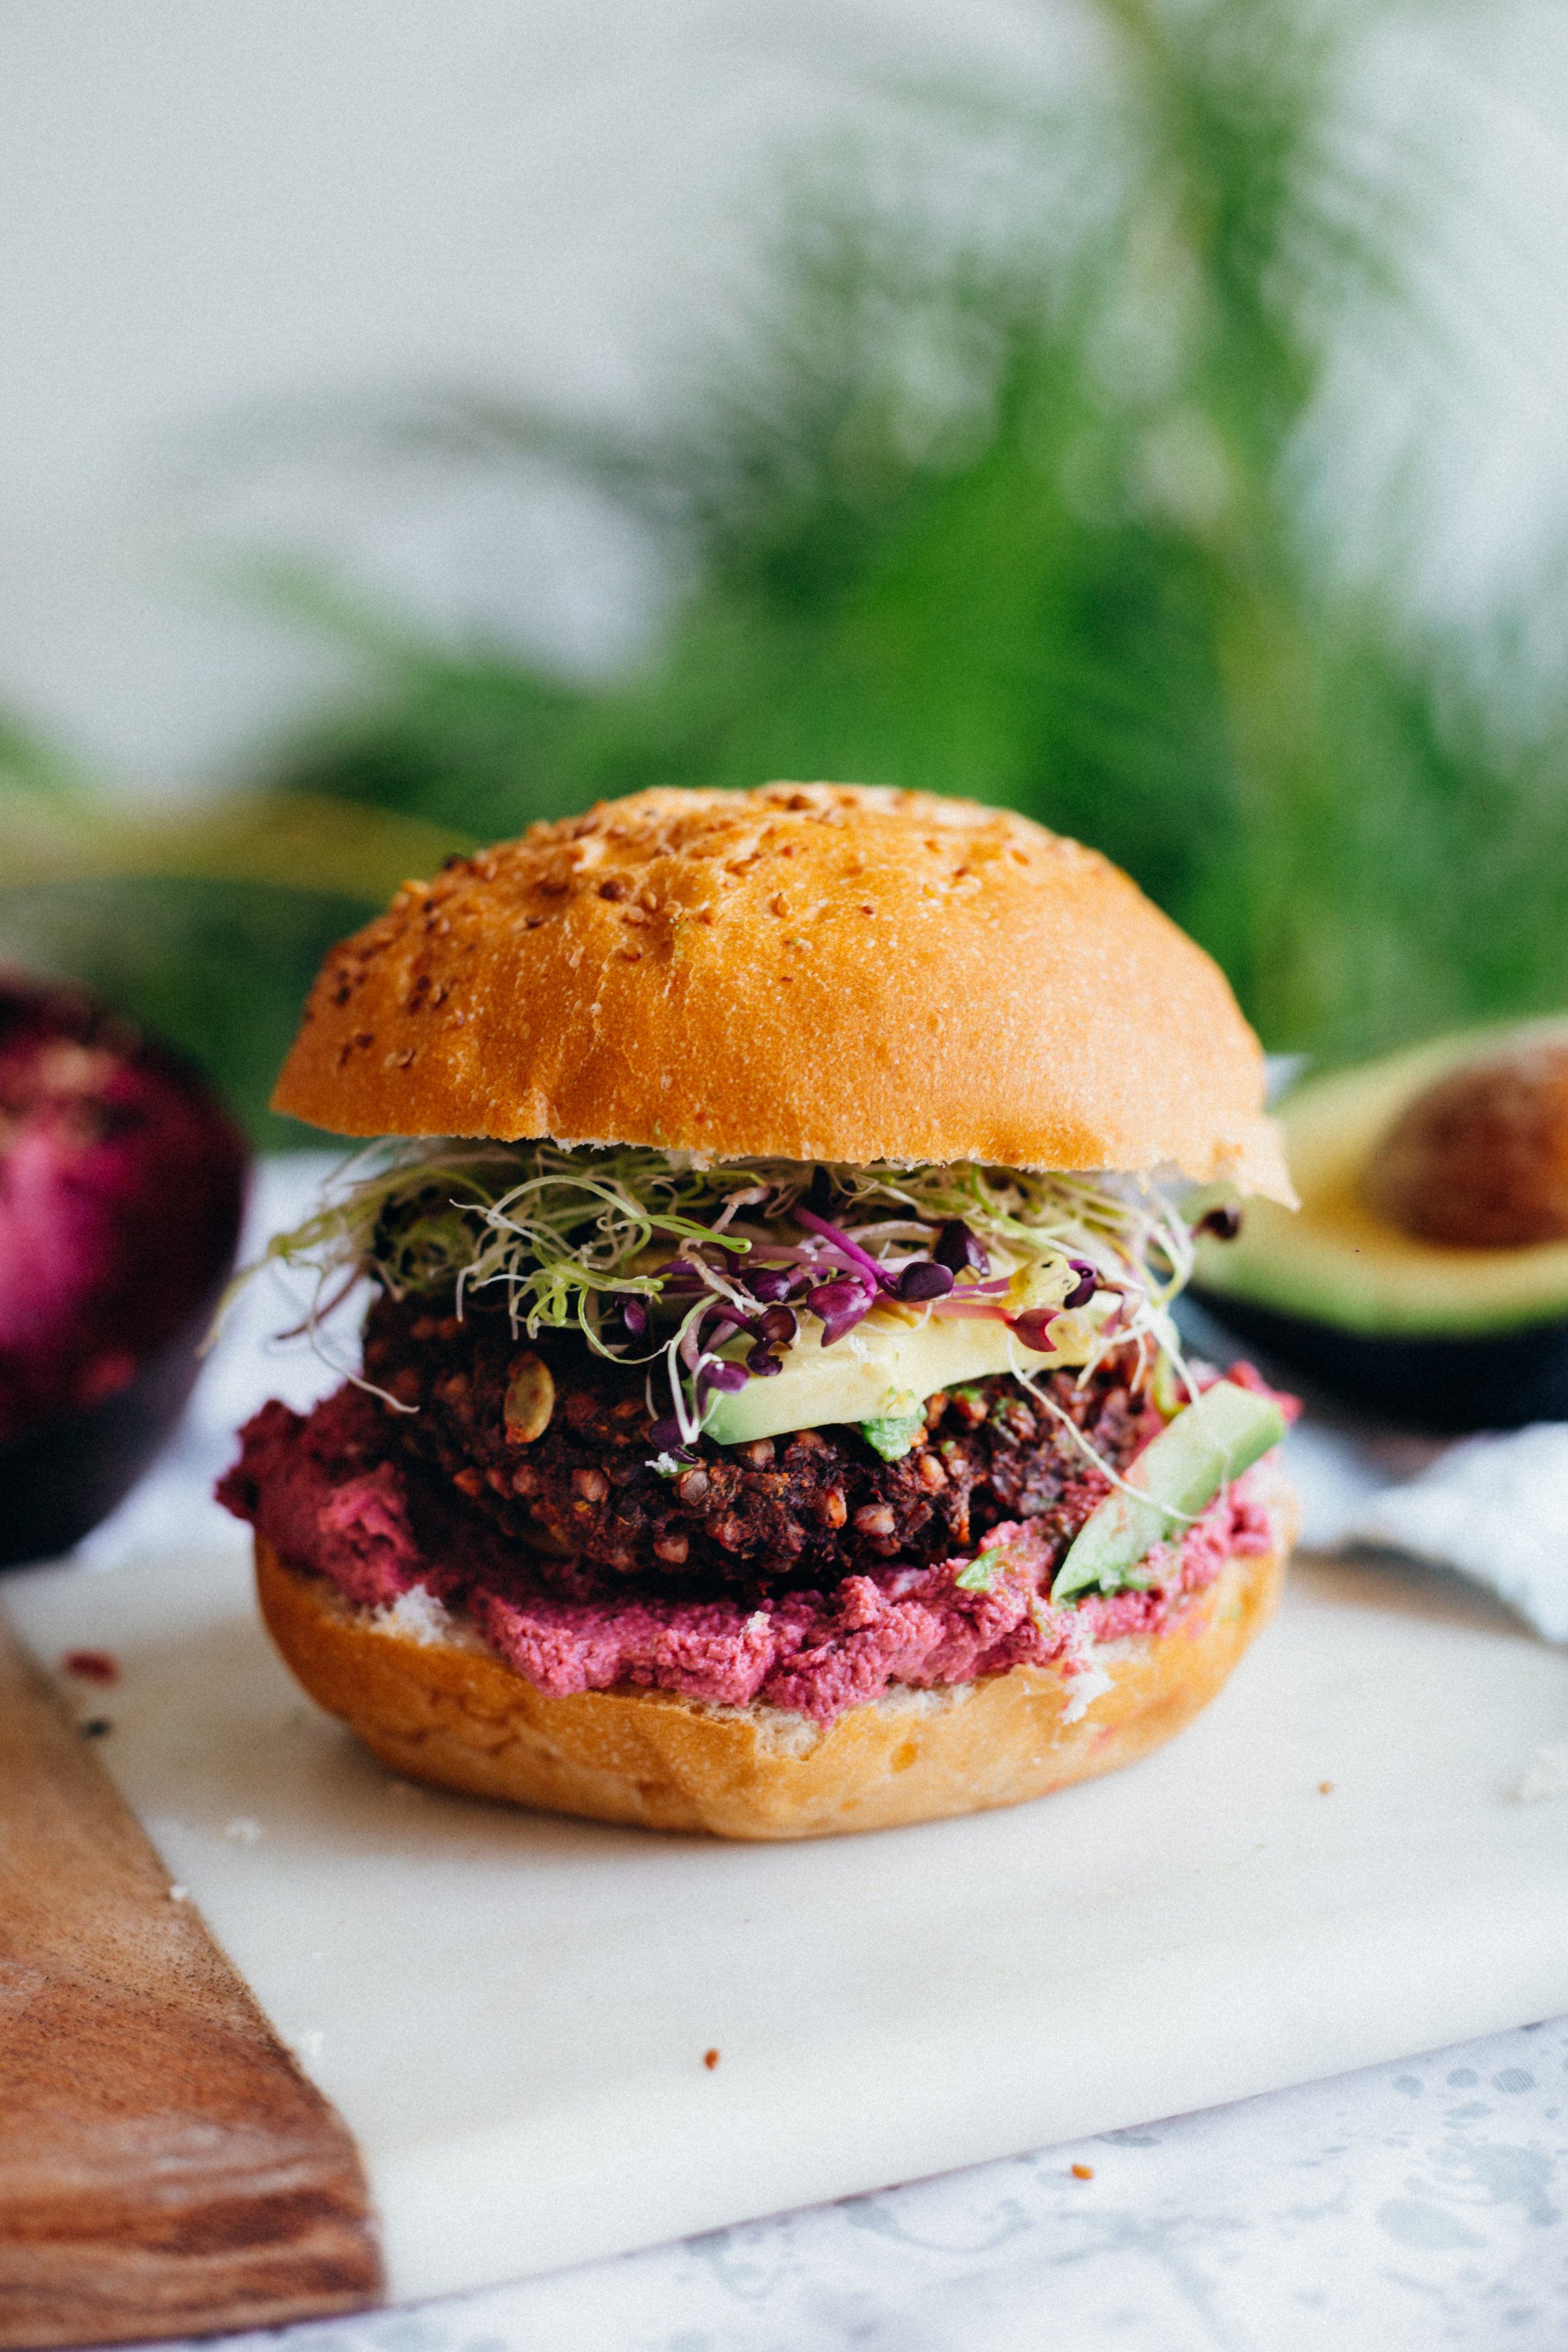 Pink Creamy Hummus & Vegan GF Buckwheat Burger - www.amelietahiti.com